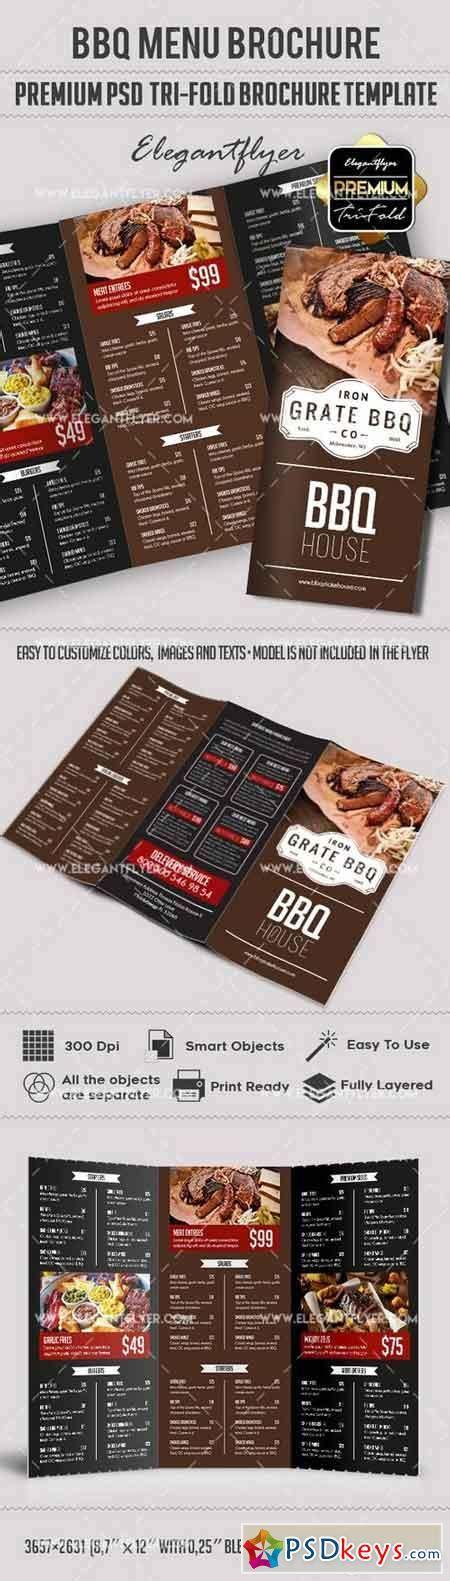 Bbq Menu Premium Tri Fold Psd Brochure Template Food Menu 187 Free Download Photoshop Vector Tri Fold Menu Template Photoshop